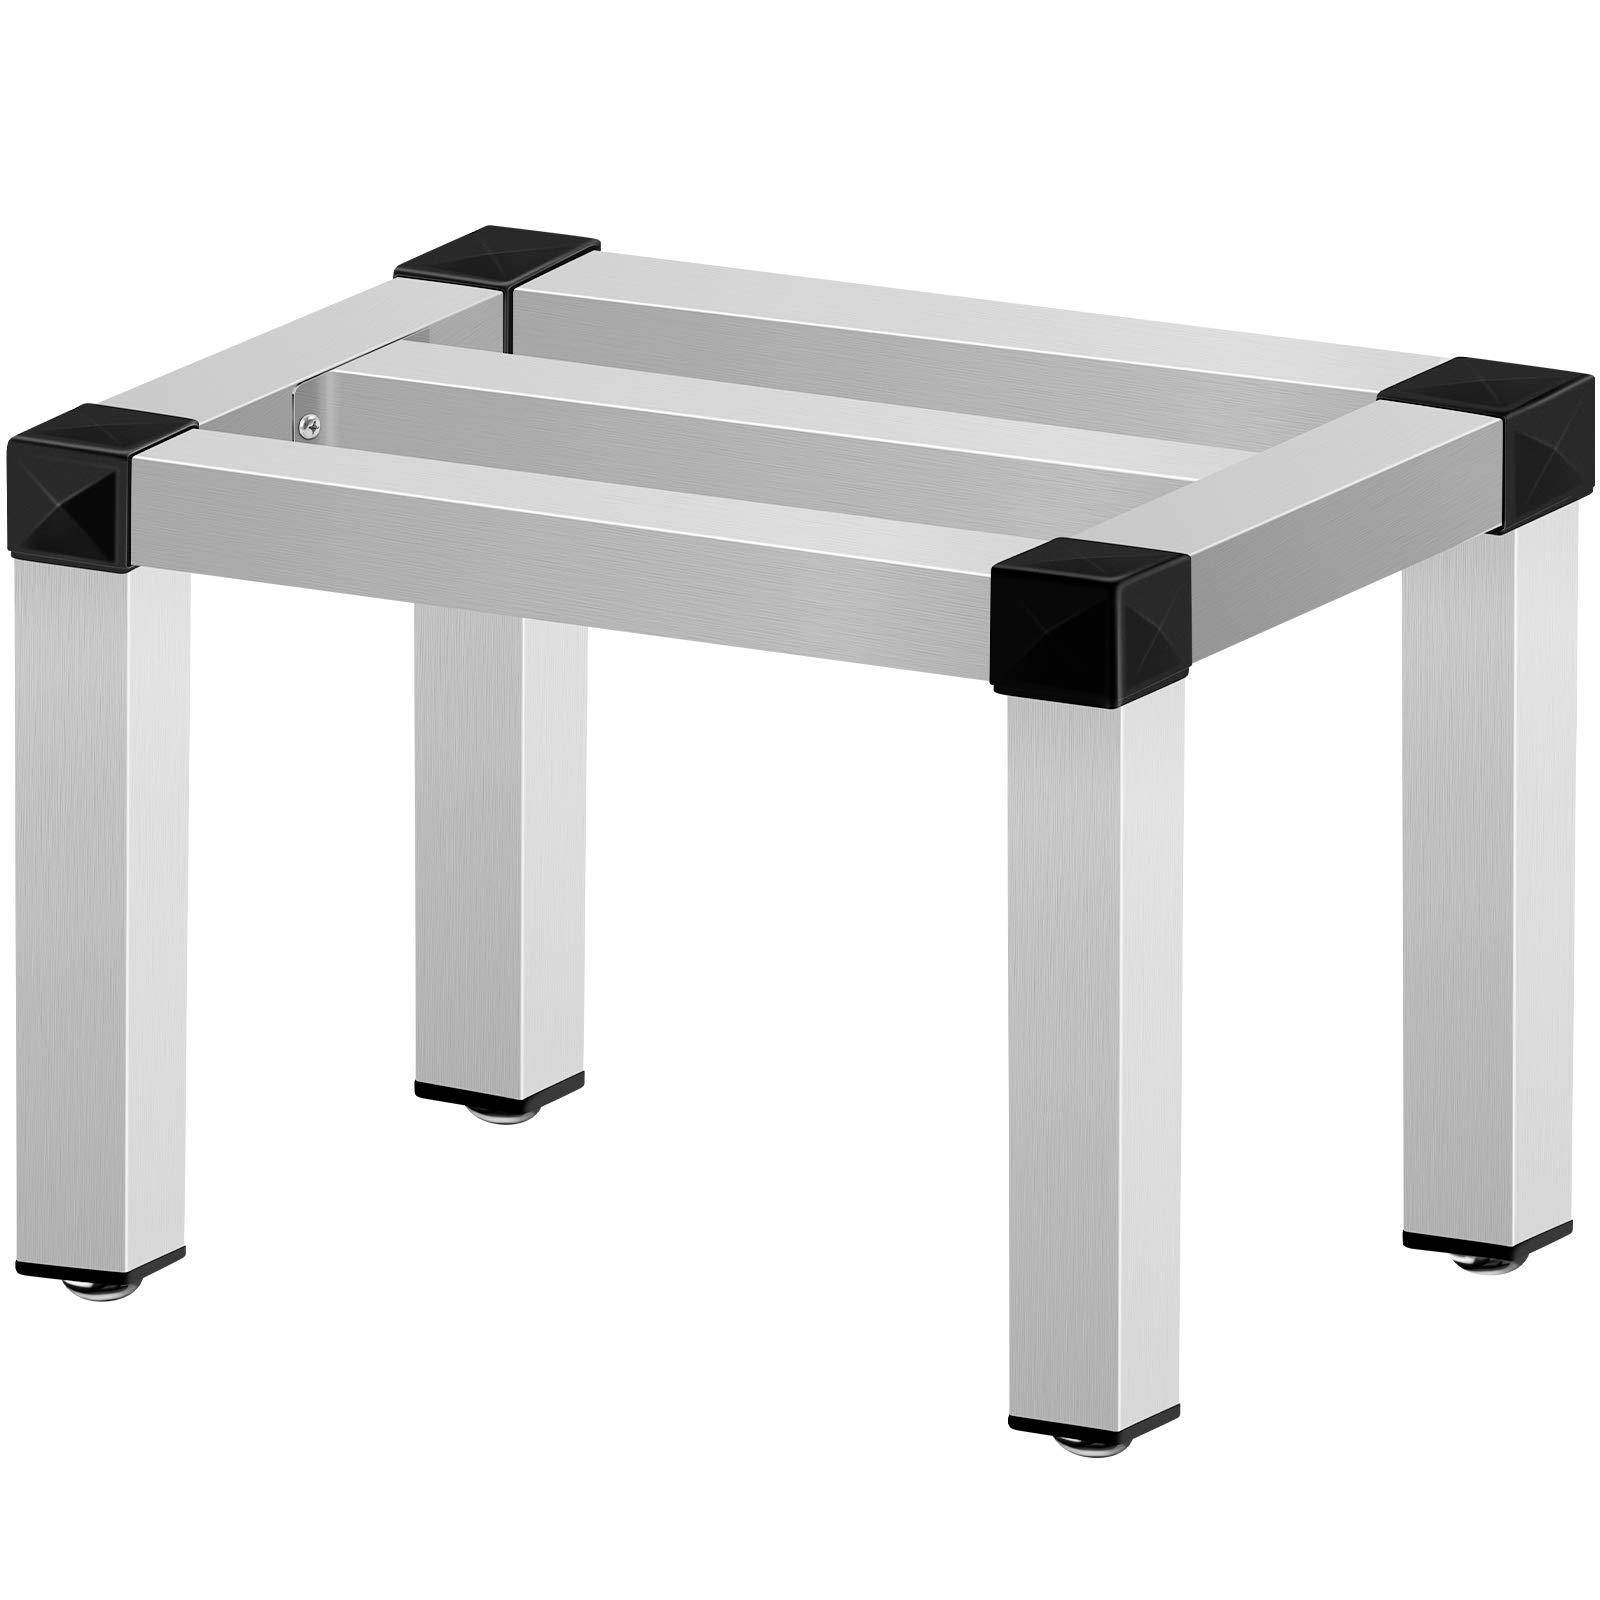 VEVOR Aluminum Dunnage Rack, 24'' x 20'' Commercial Floor Food Shelf, 12'' off the Floor, 1000lbs Capacity Aluminum Storage Rack, Commercial Food Service Storage in Restaurant, Kitchens, Shops